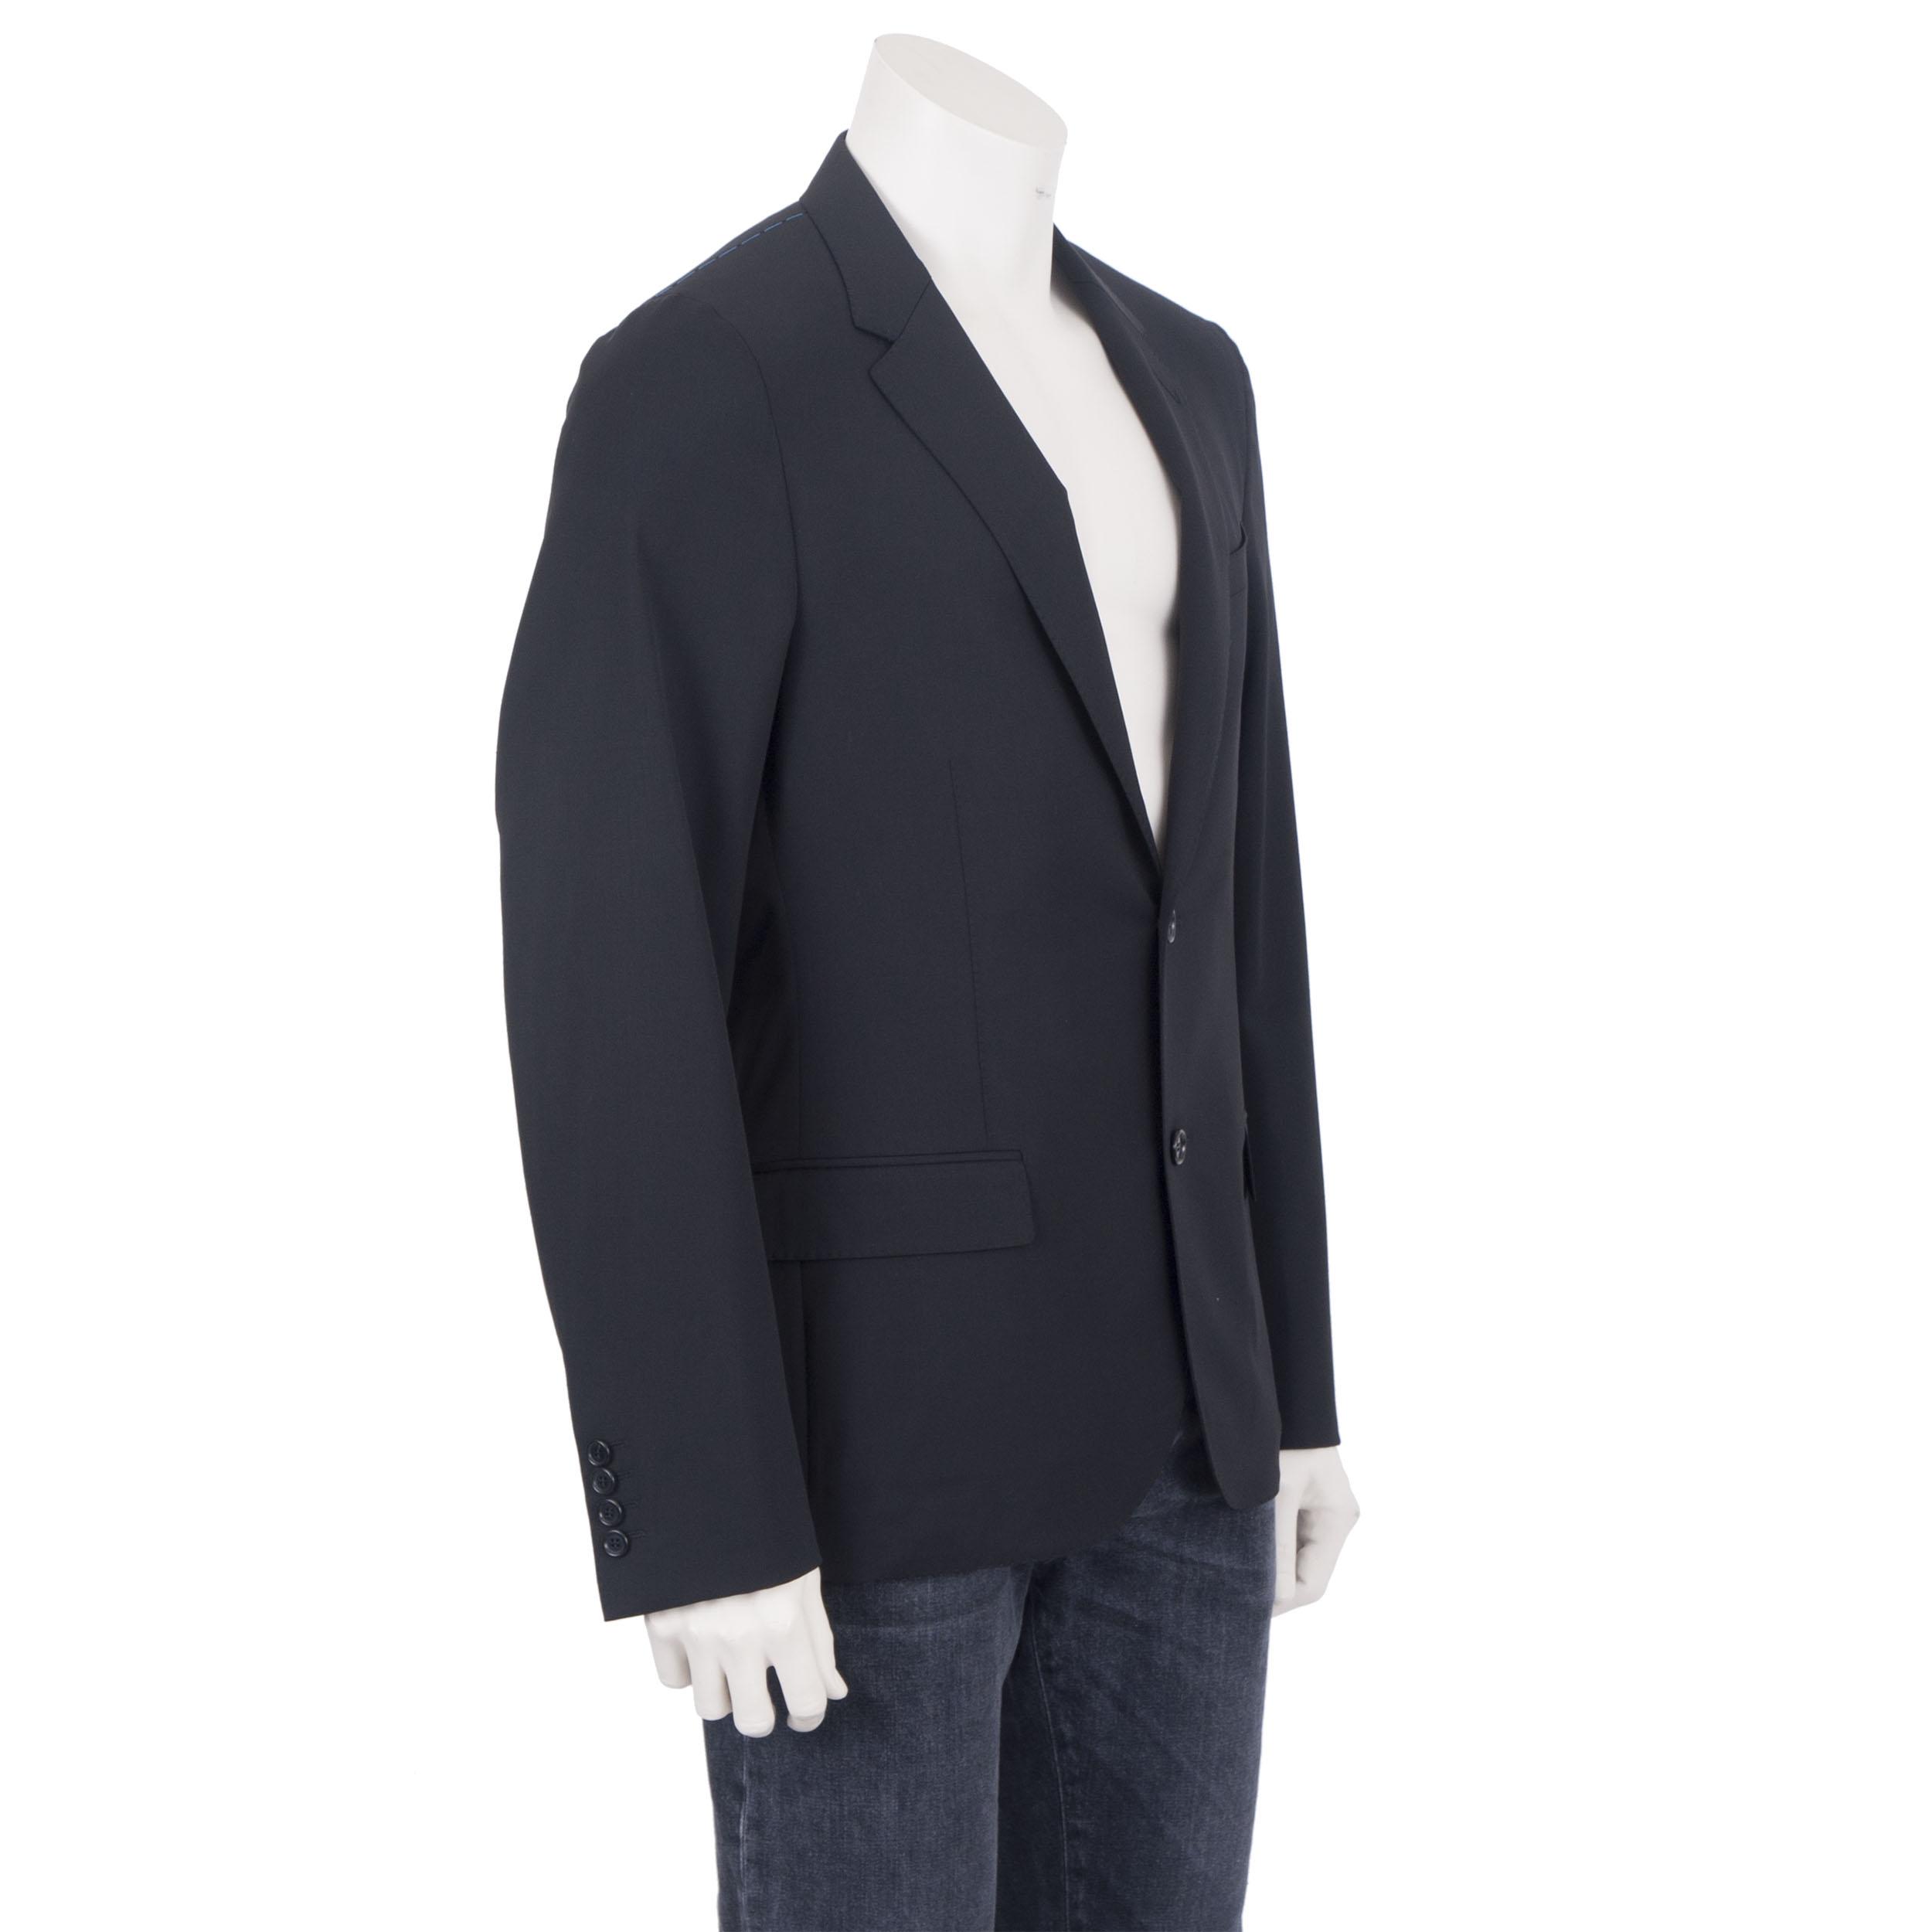 LANVIN 1950$ Authentic New Black Wool Lightweight Tailored Blazer Jacket